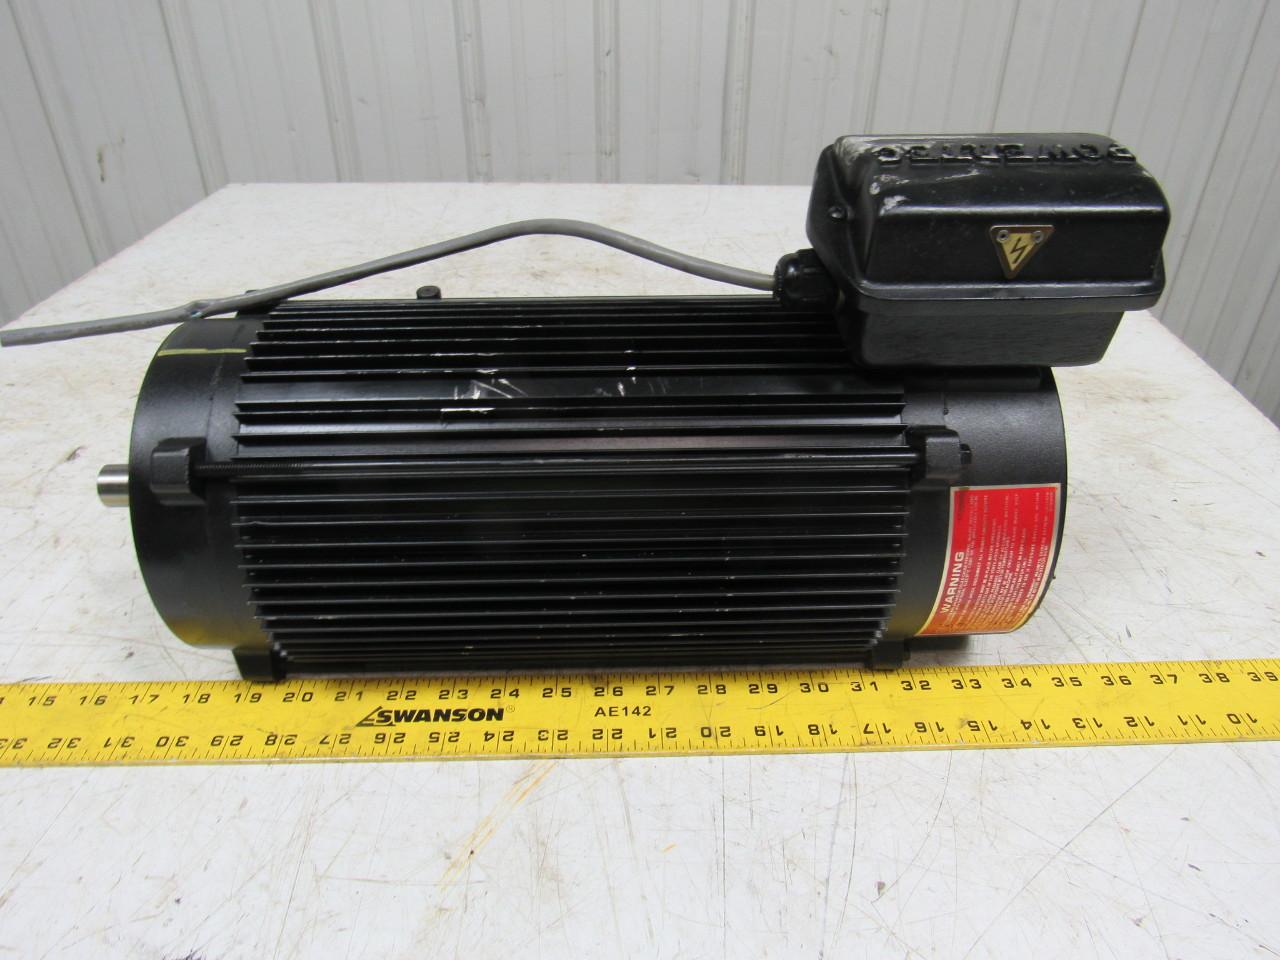 Powertec L14cla1100700000 Brushless Dc Servo Motor 3 Hp 1750 Rpm Tenv L145tc Ebay